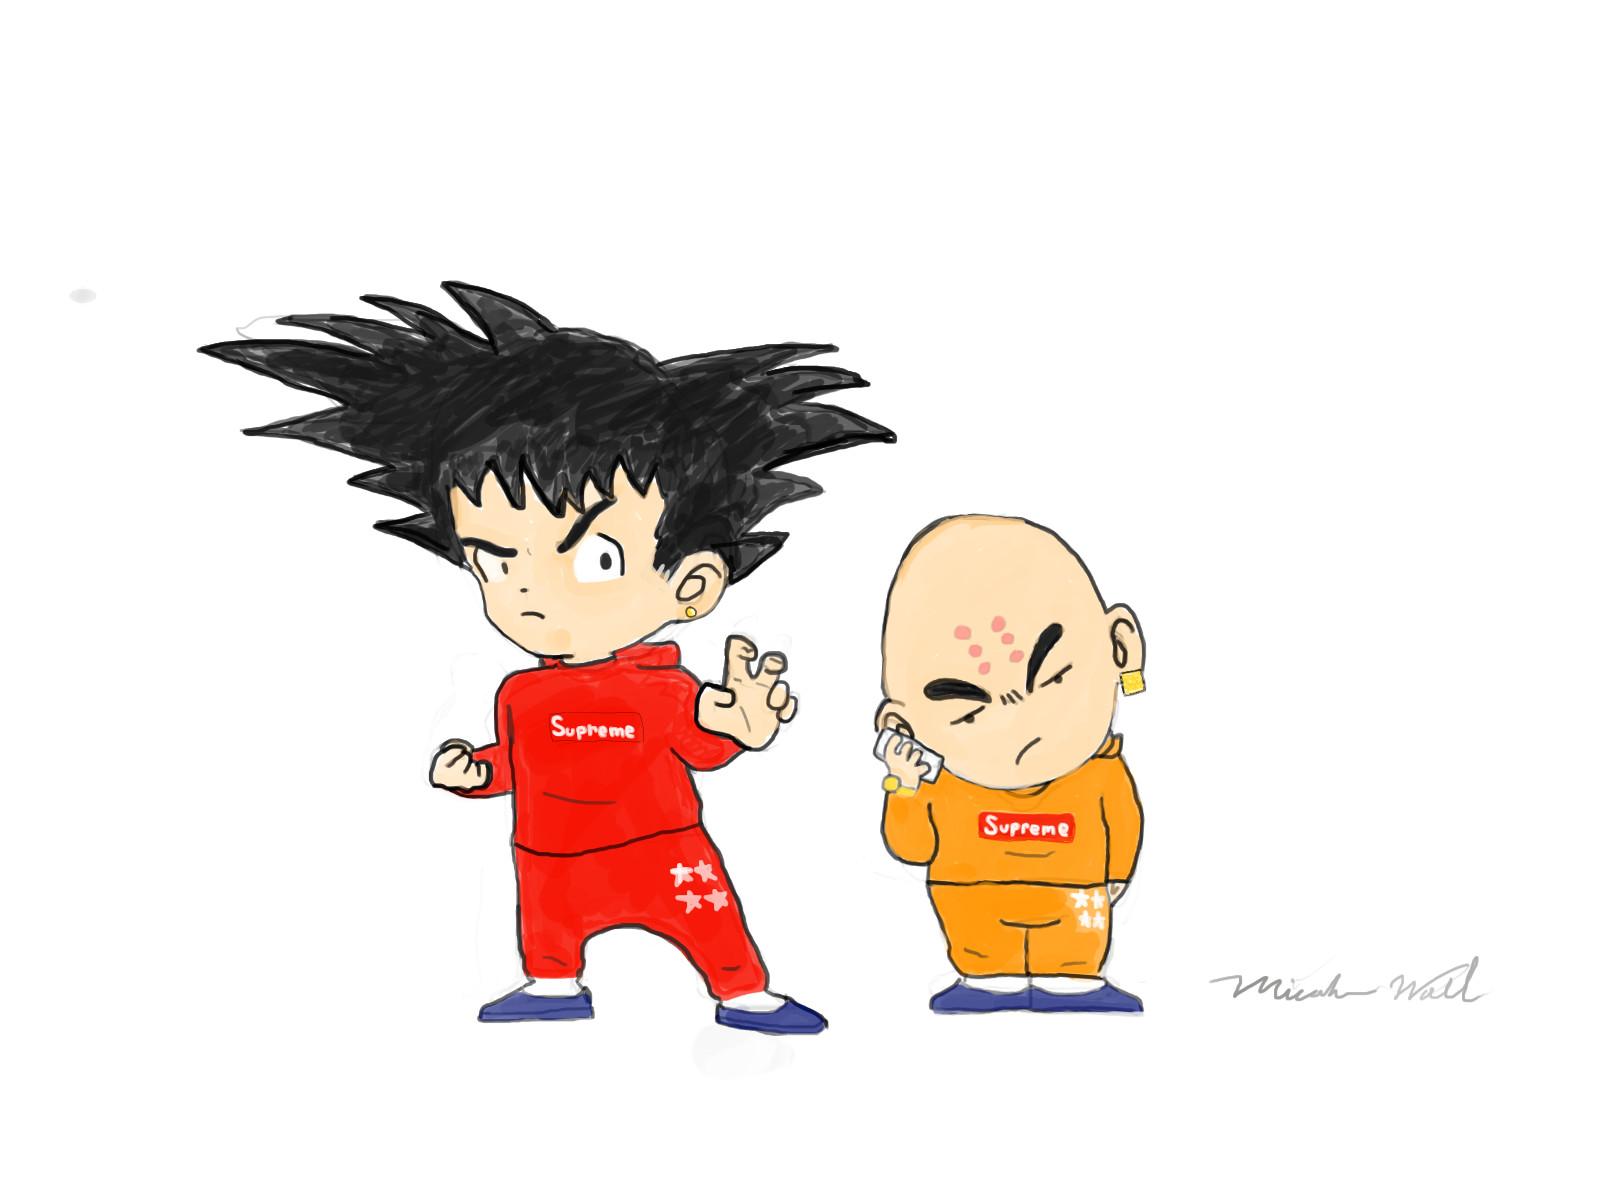 Goku X Krillin Goku And Krillin Supreme 1545516 Hd Wallpaper Backgrounds Download